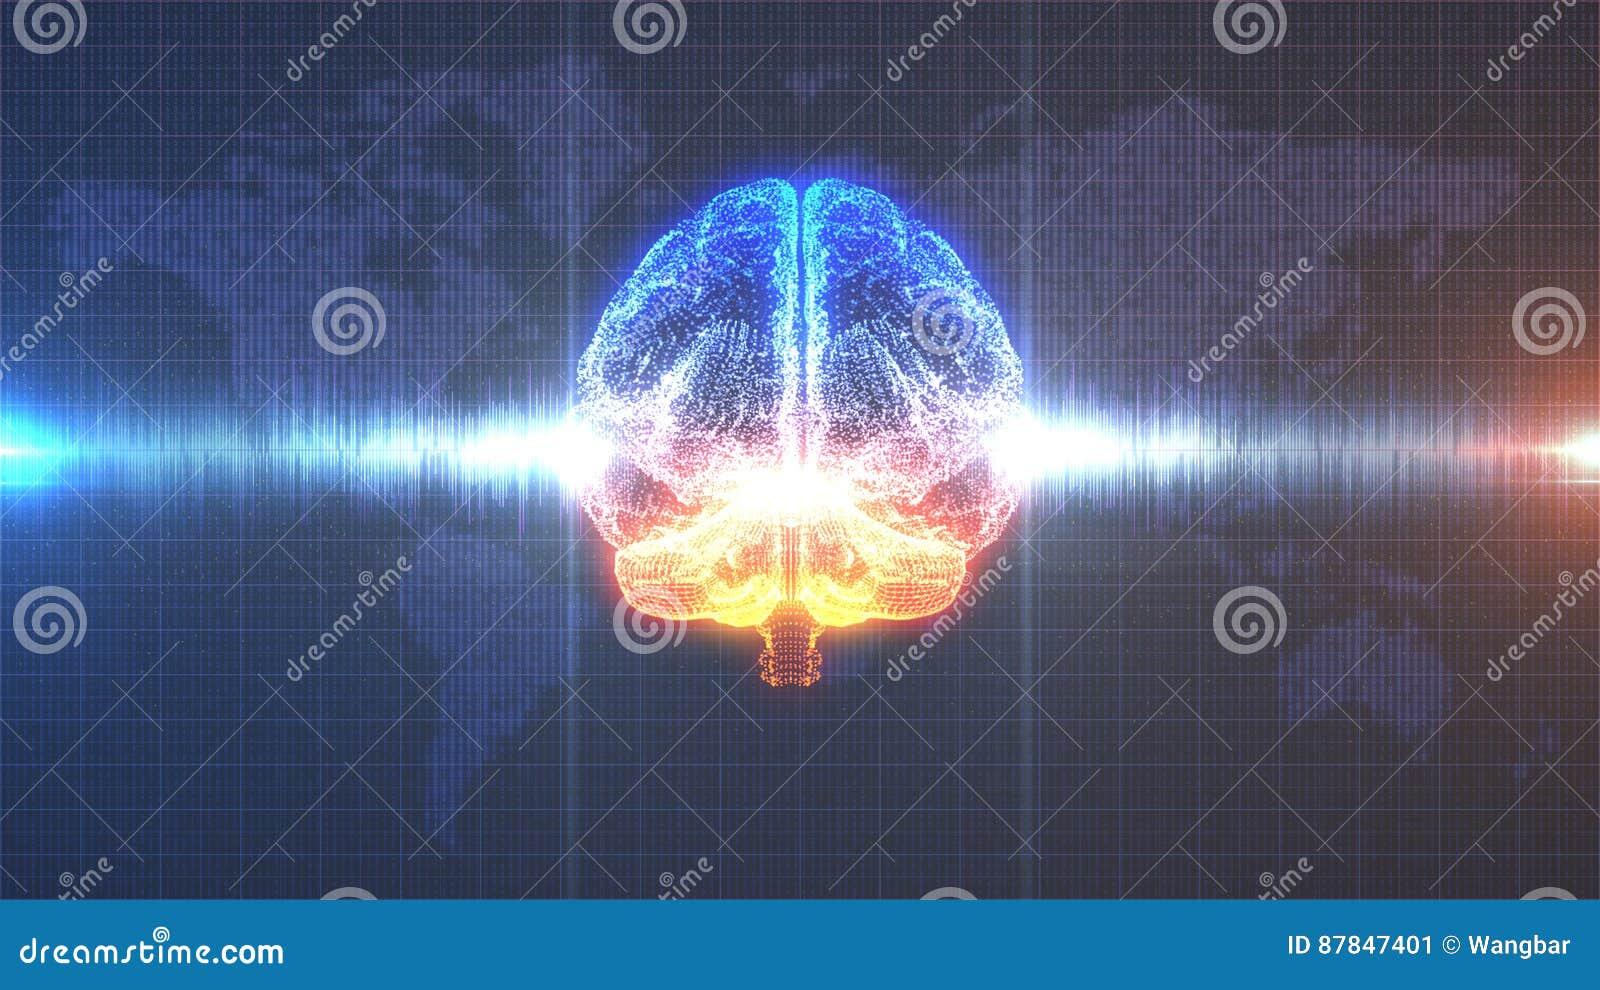 Brainstorm - orange and blue digital brain with brainwave animation